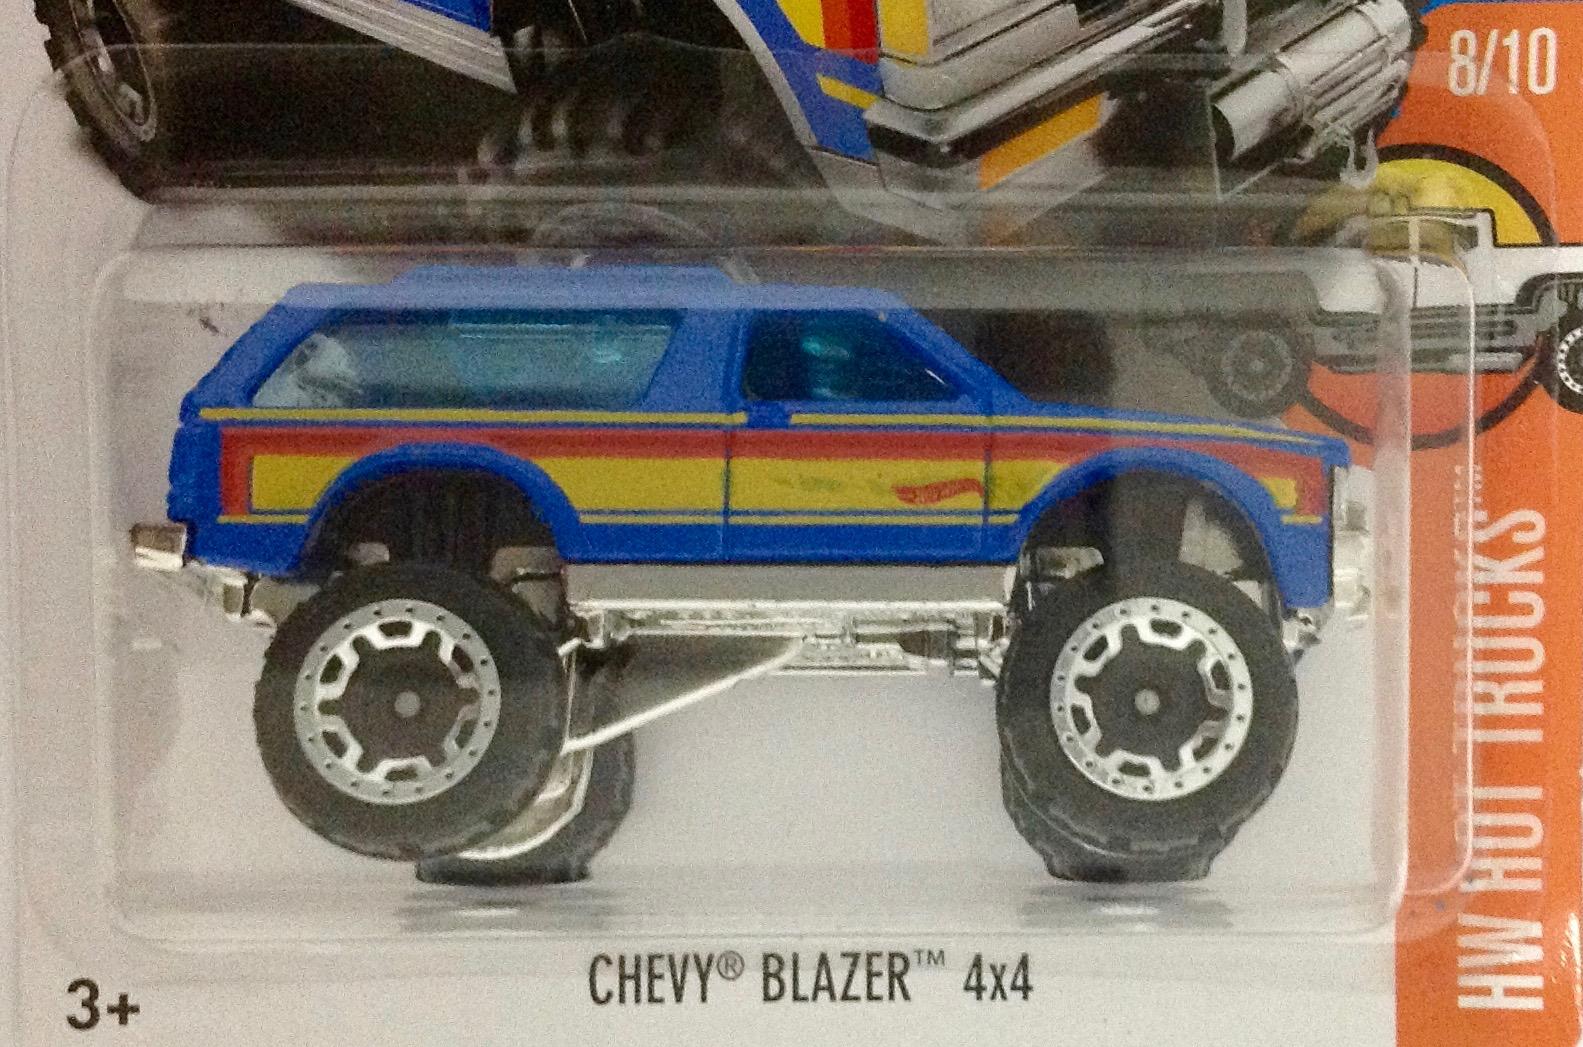 Image chevy blazer 4x4 dtx76g hot wheels wiki fandom chevy blazer 4x4 dtx76g sciox Gallery